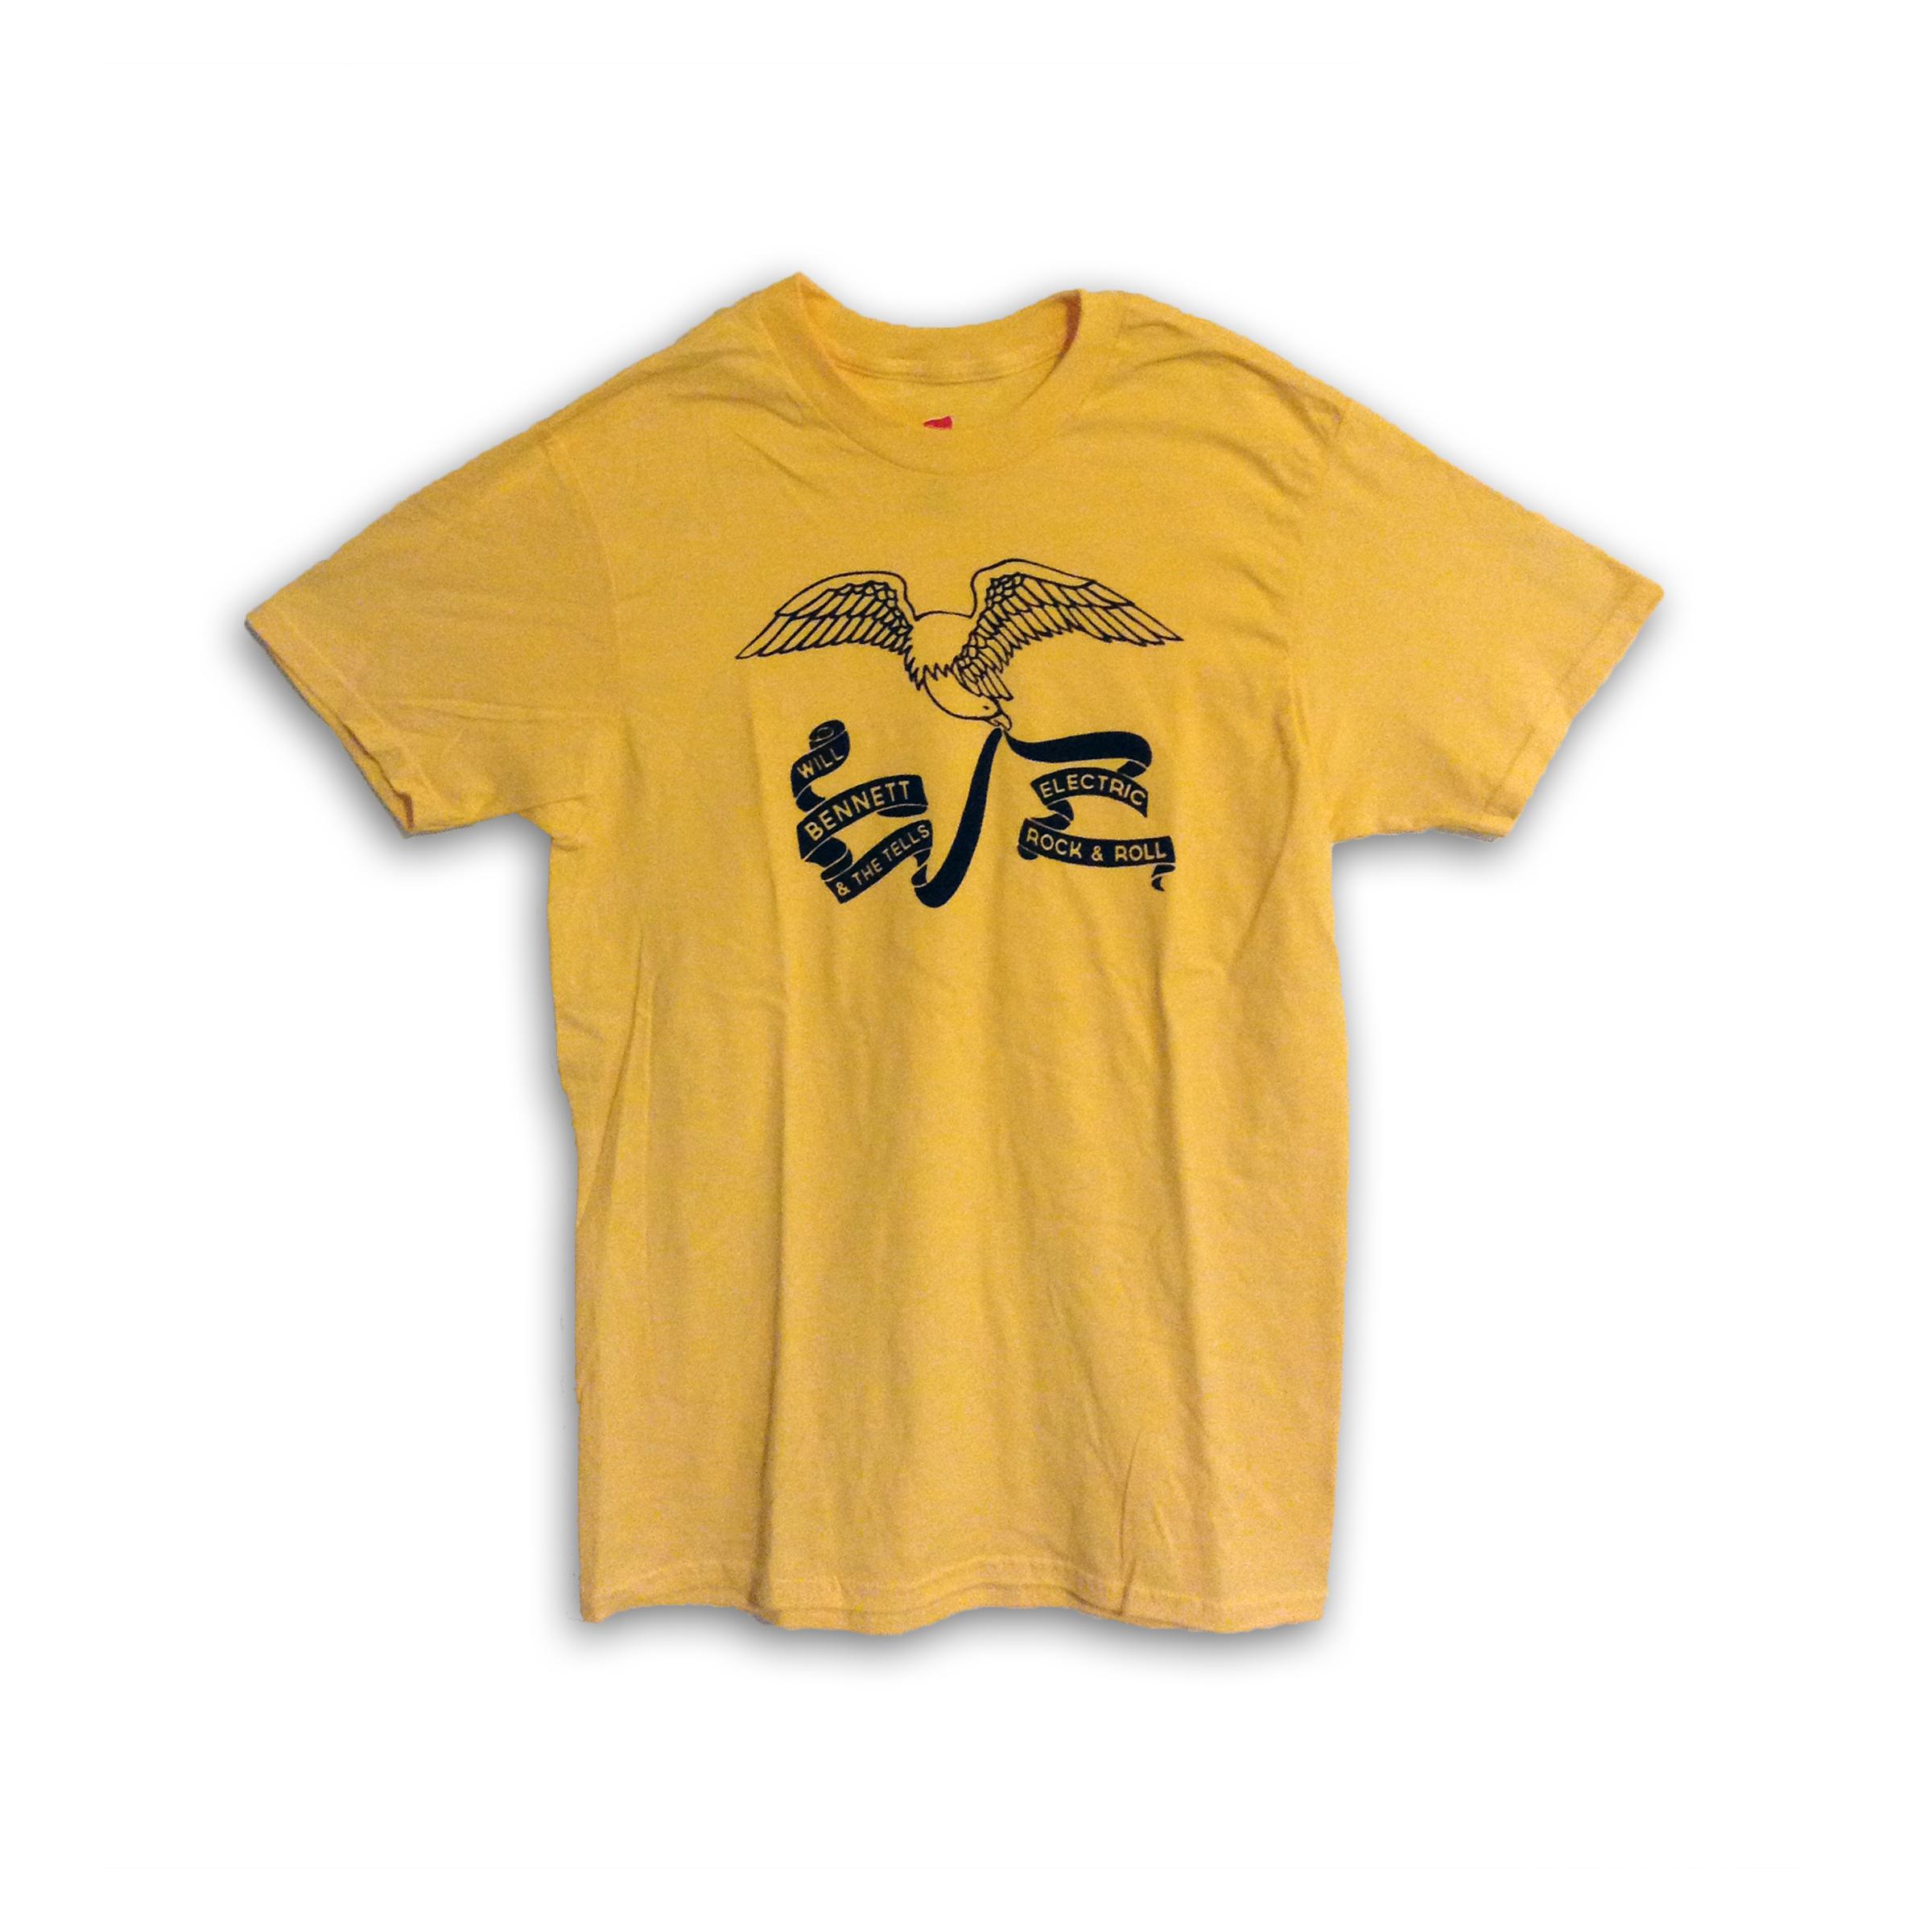 Hand-Printed Eagle T-Shirt